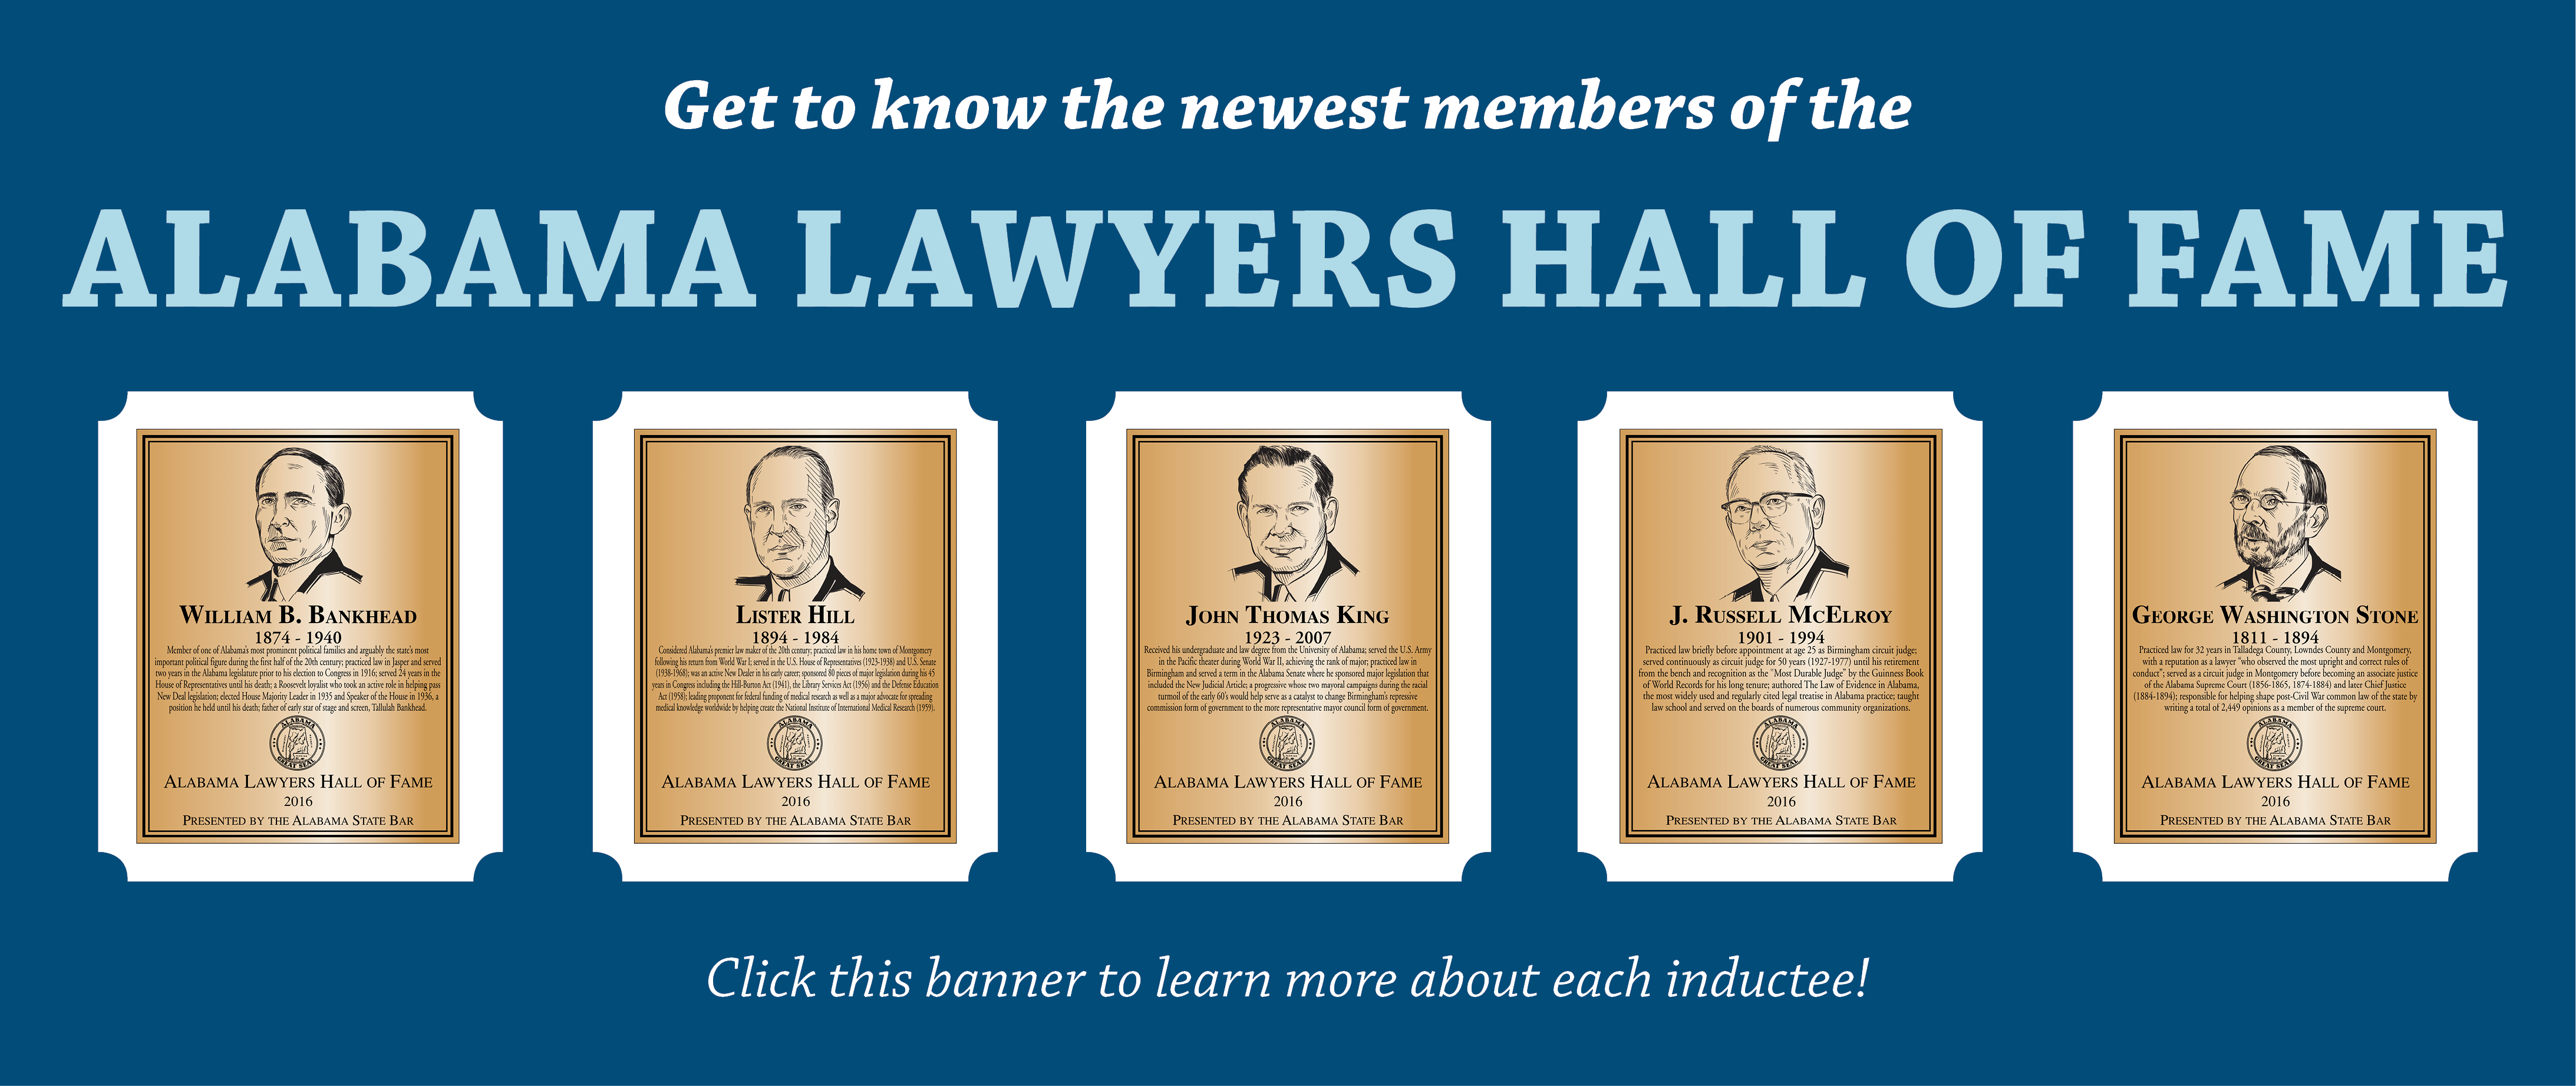 Alabama Lawyers Hall of Fame